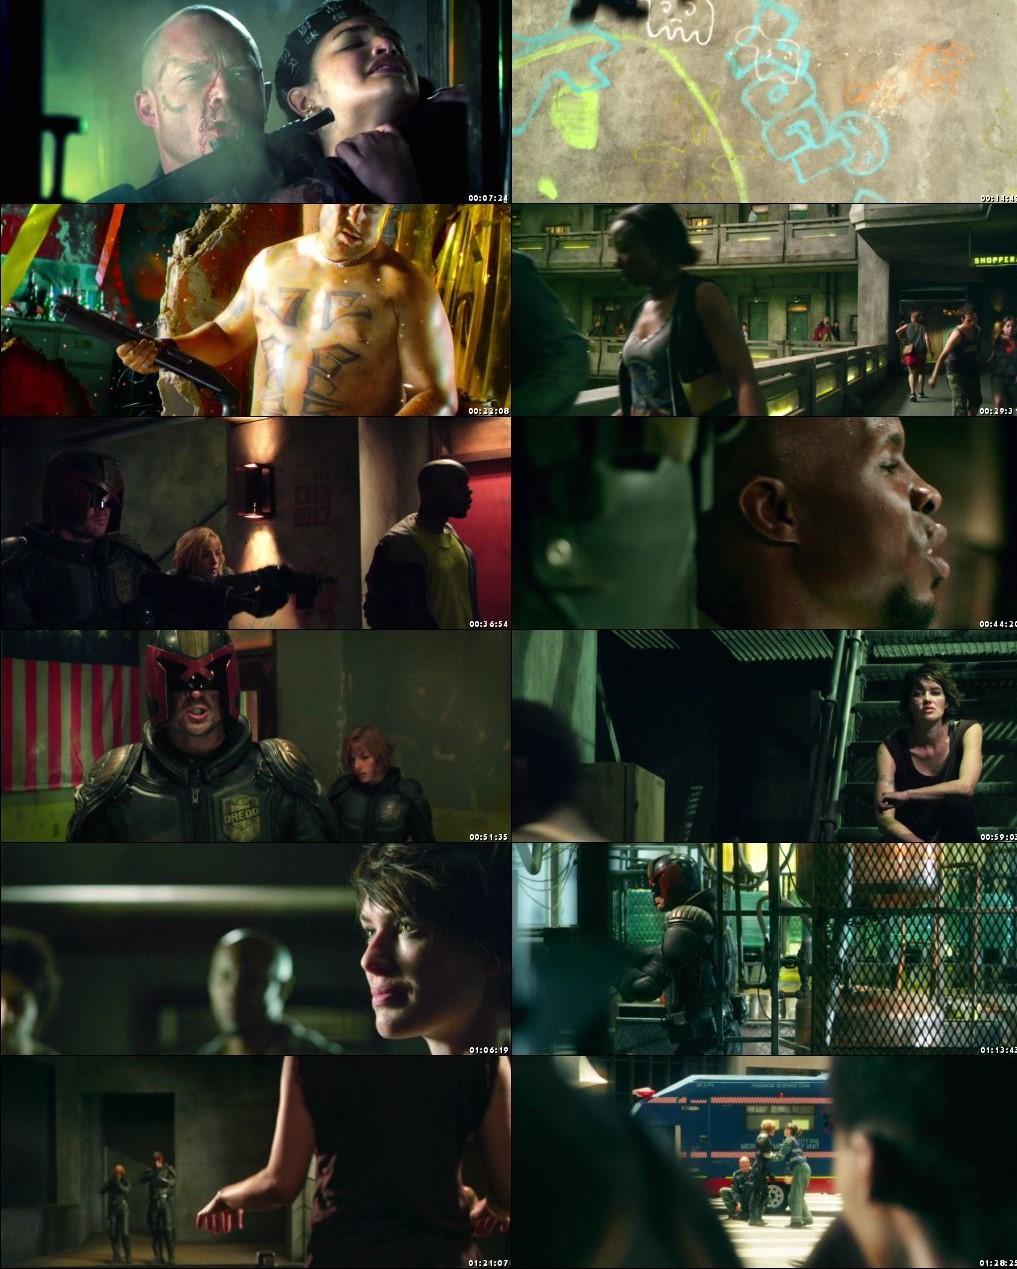 Dredd 2012 BRRip 1080p Dual Audio In Hindi English